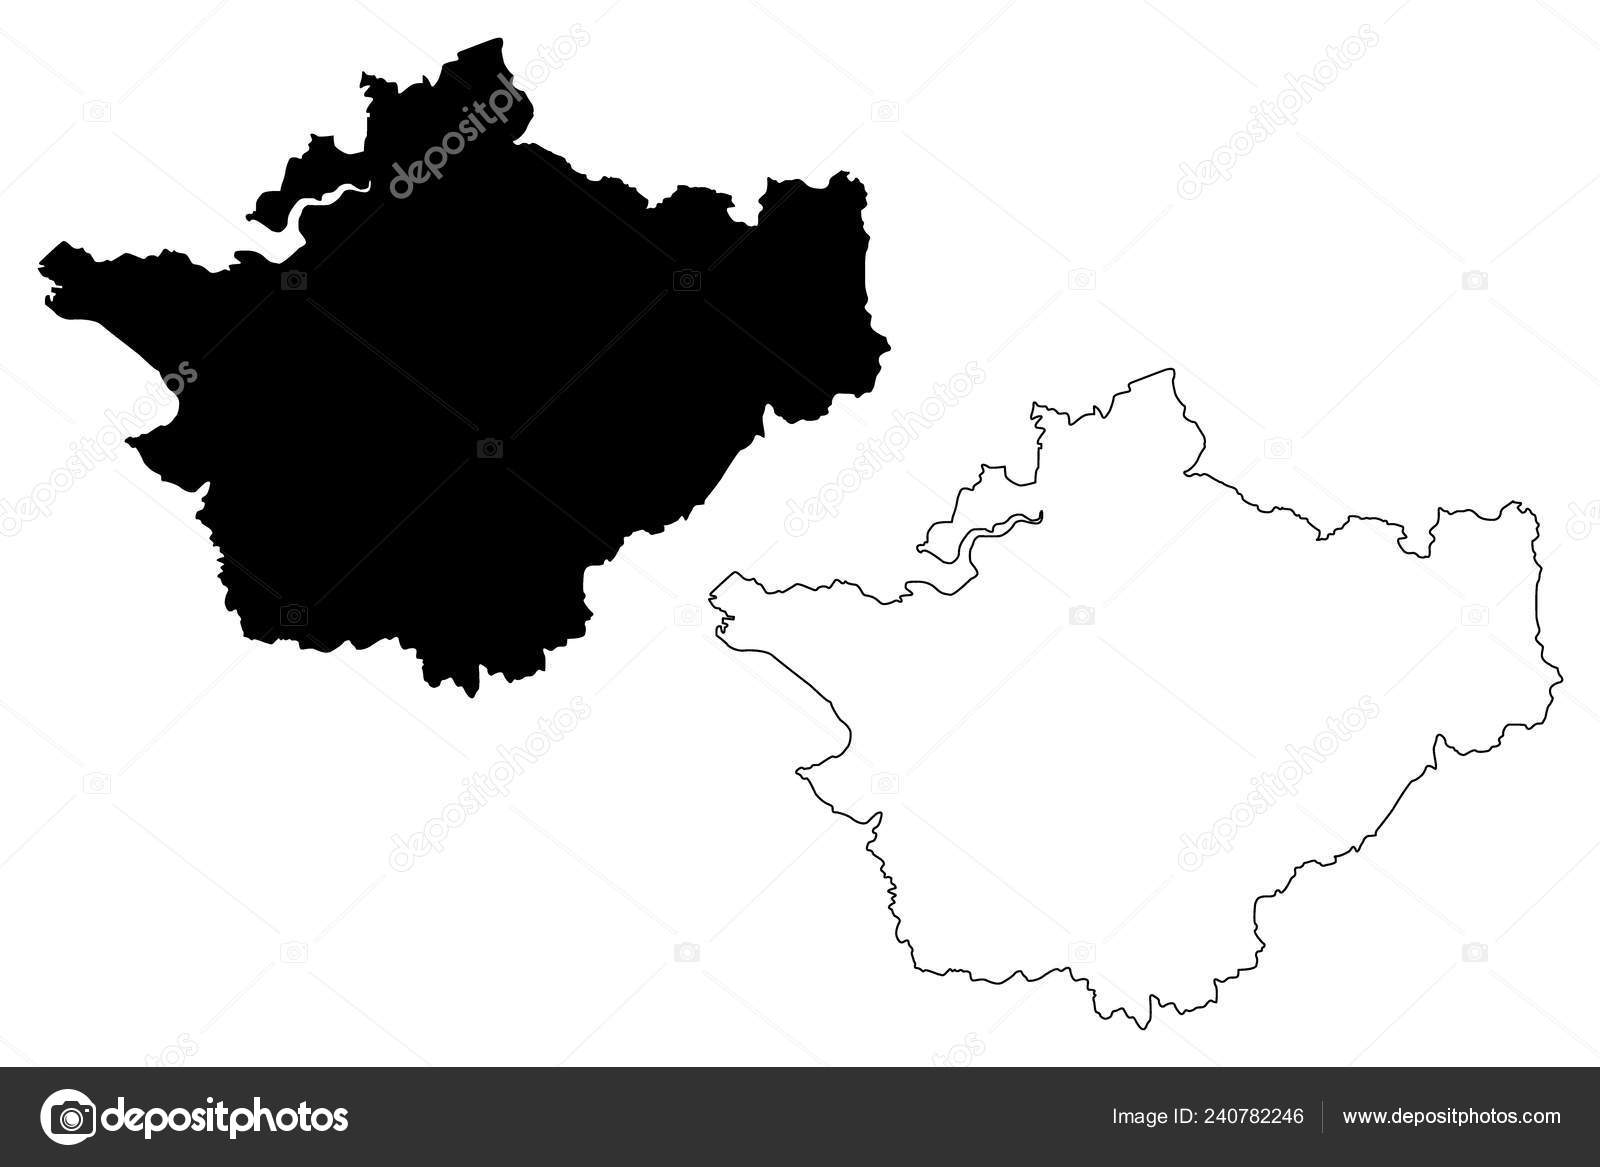 Cheshire United Kingdom England Non Metropolitan County Shire County